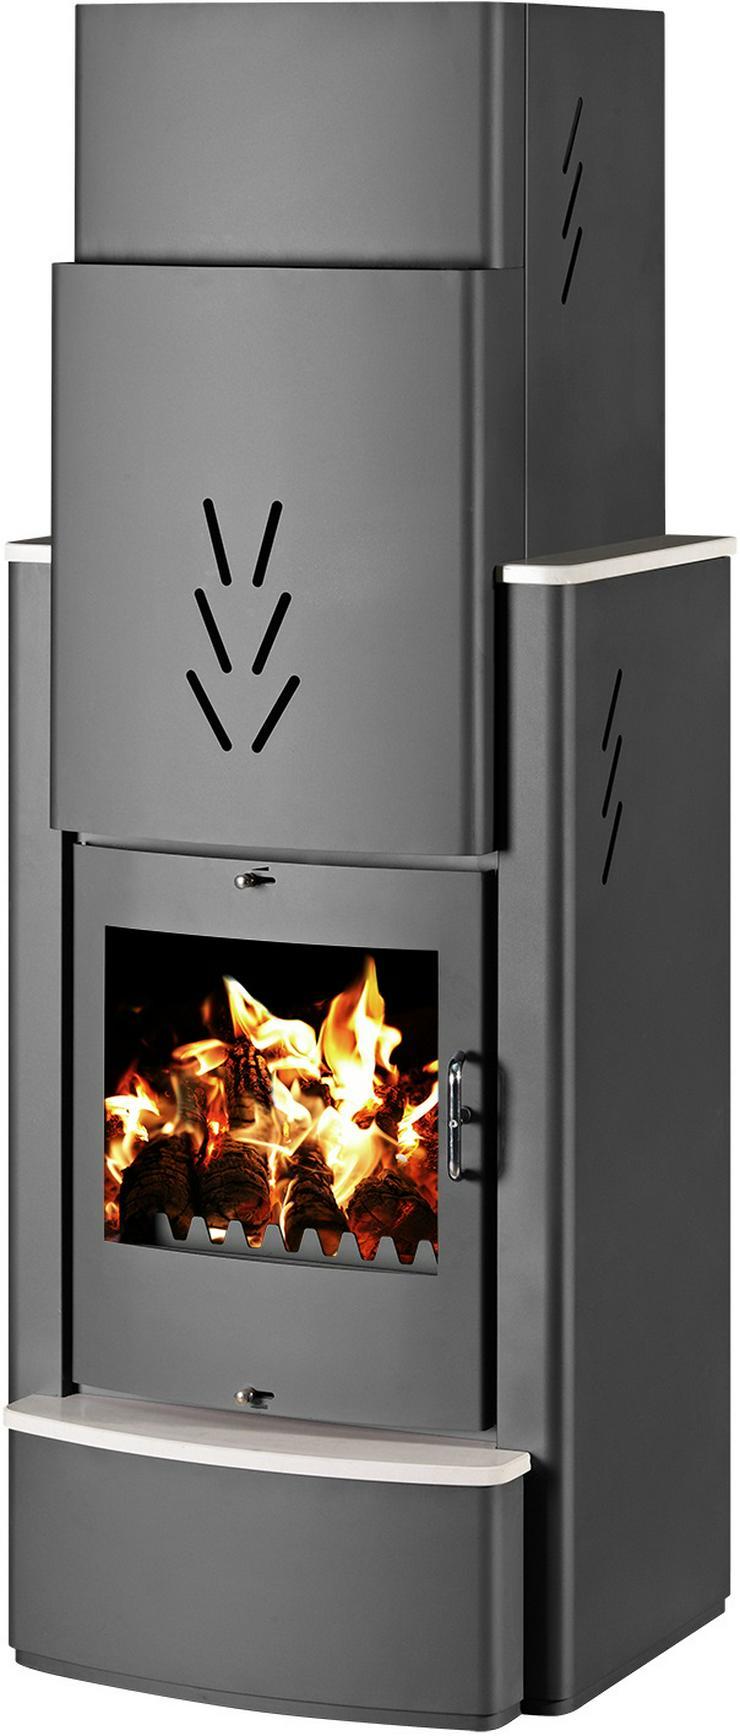 Kaminofen Sonata 16 KW Ofen Kamin für Haus, Atelier. PRE prehalle